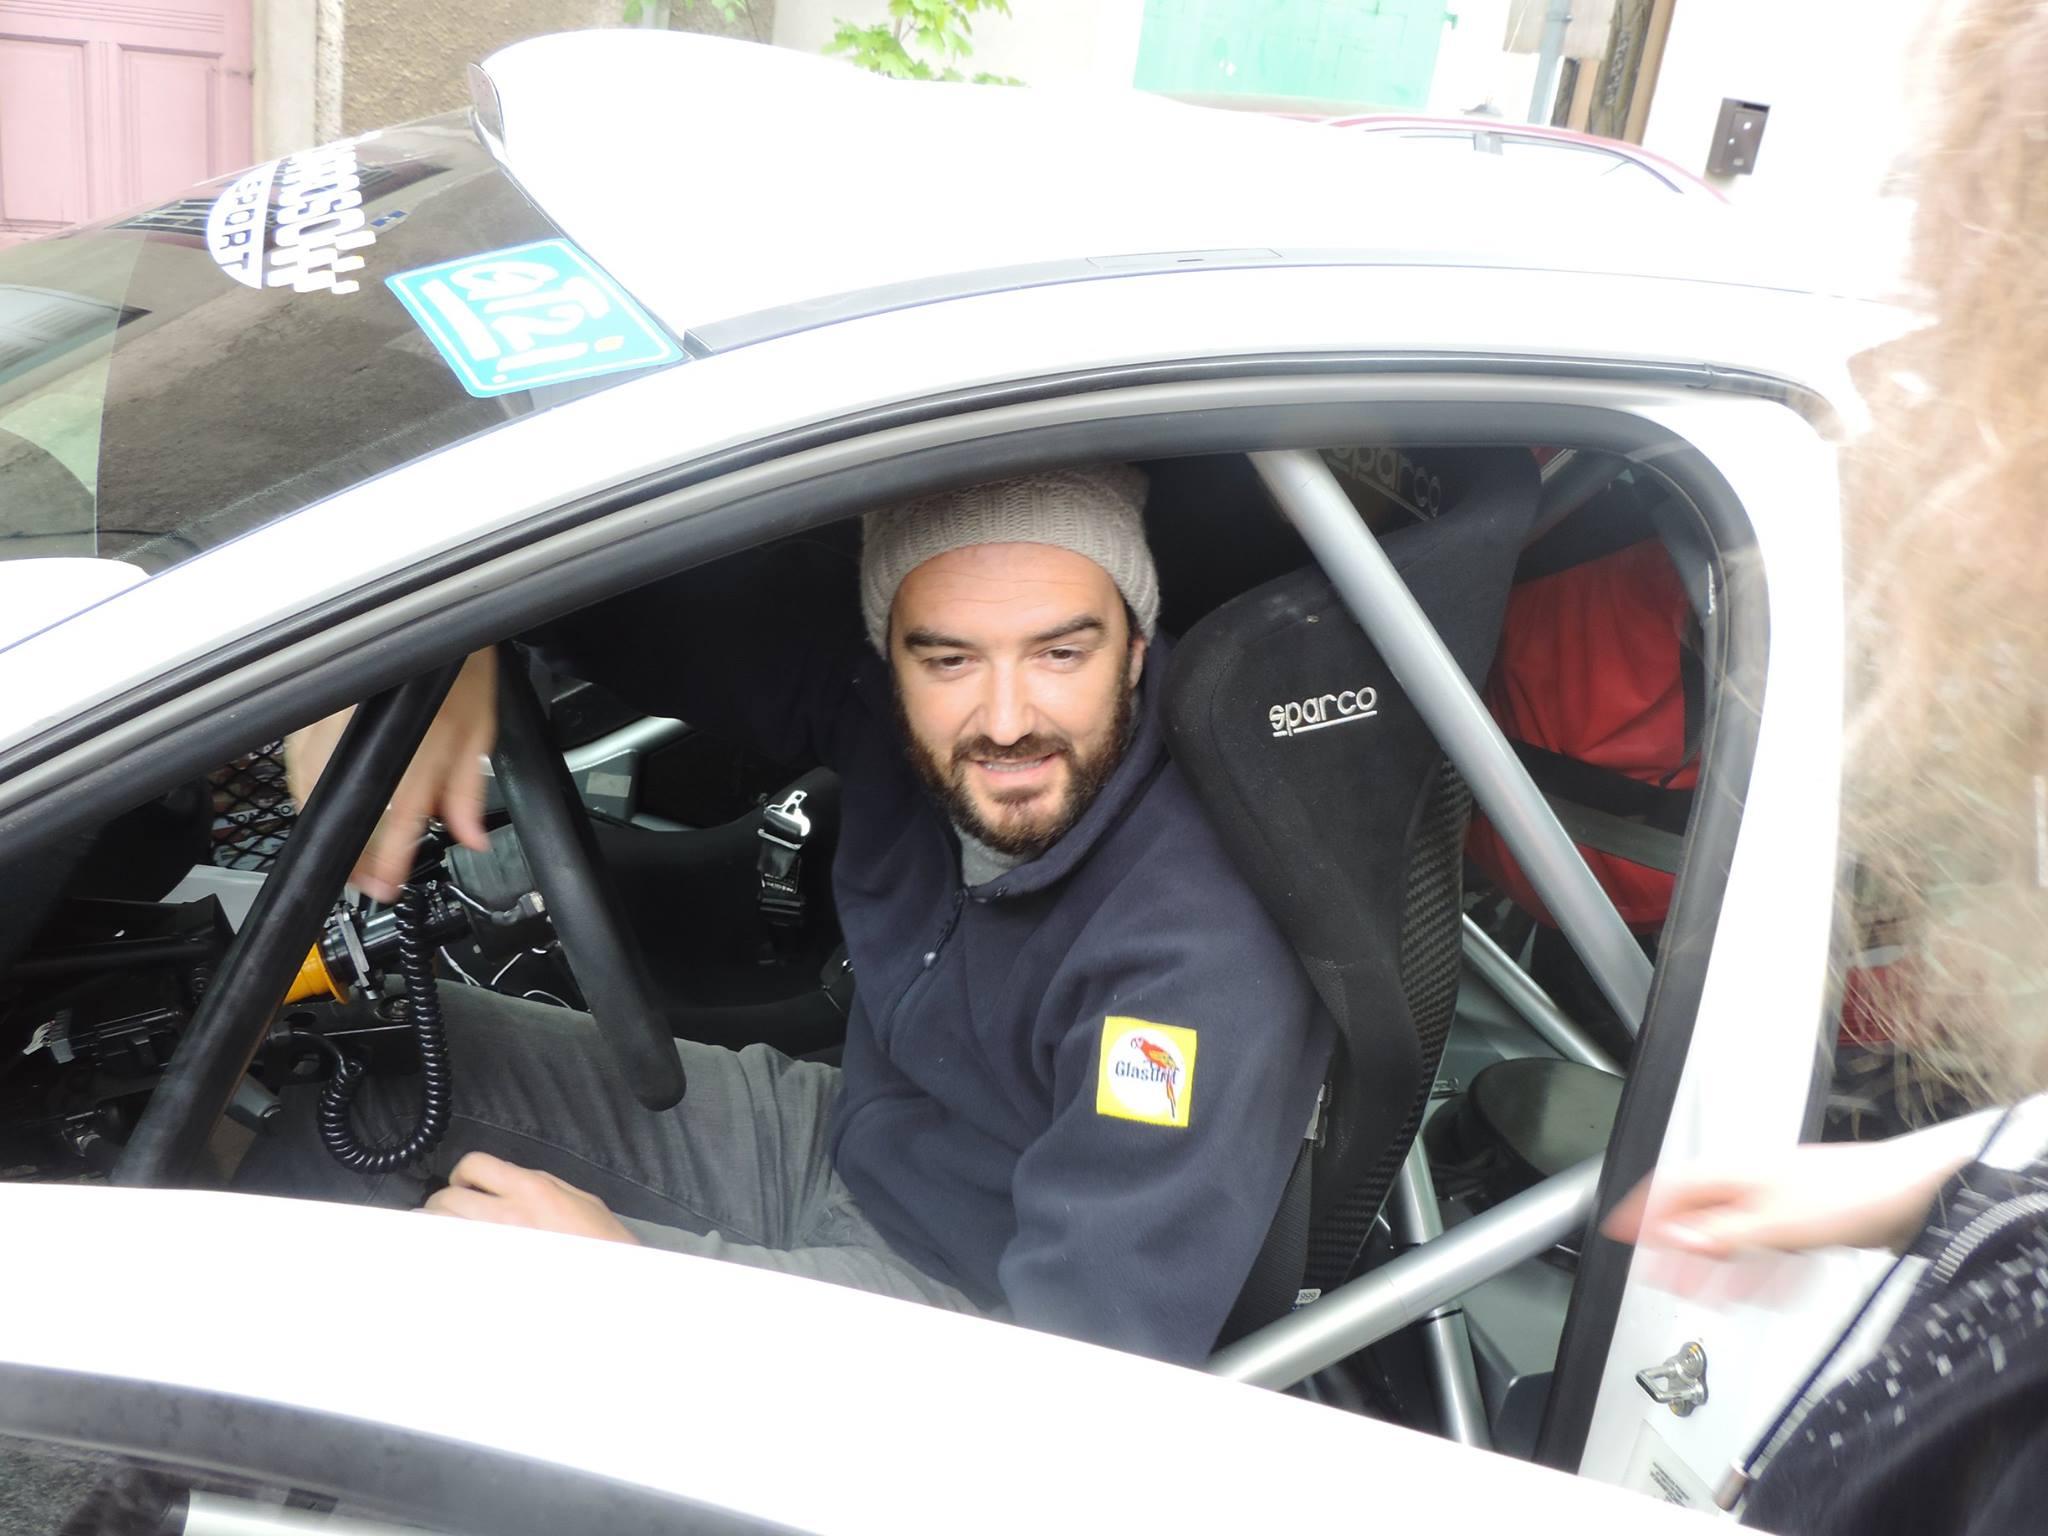 Course de pilote de voiture sexy